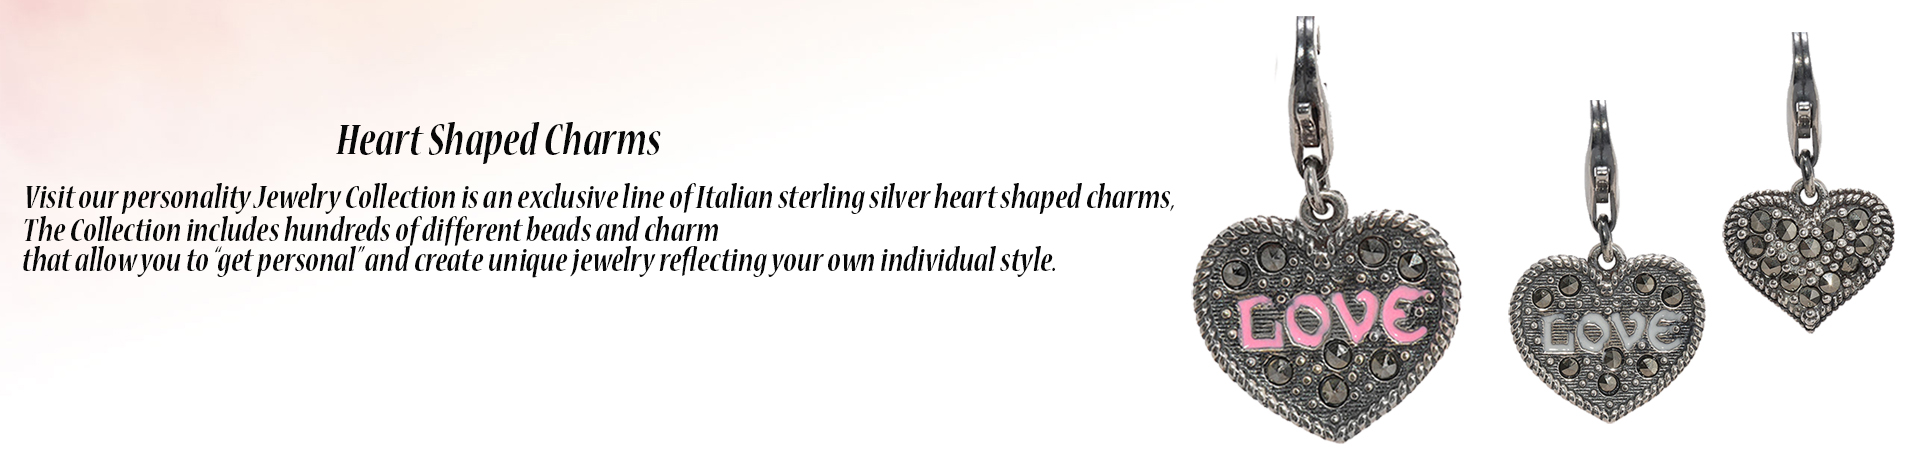 Heart Shaped Charms